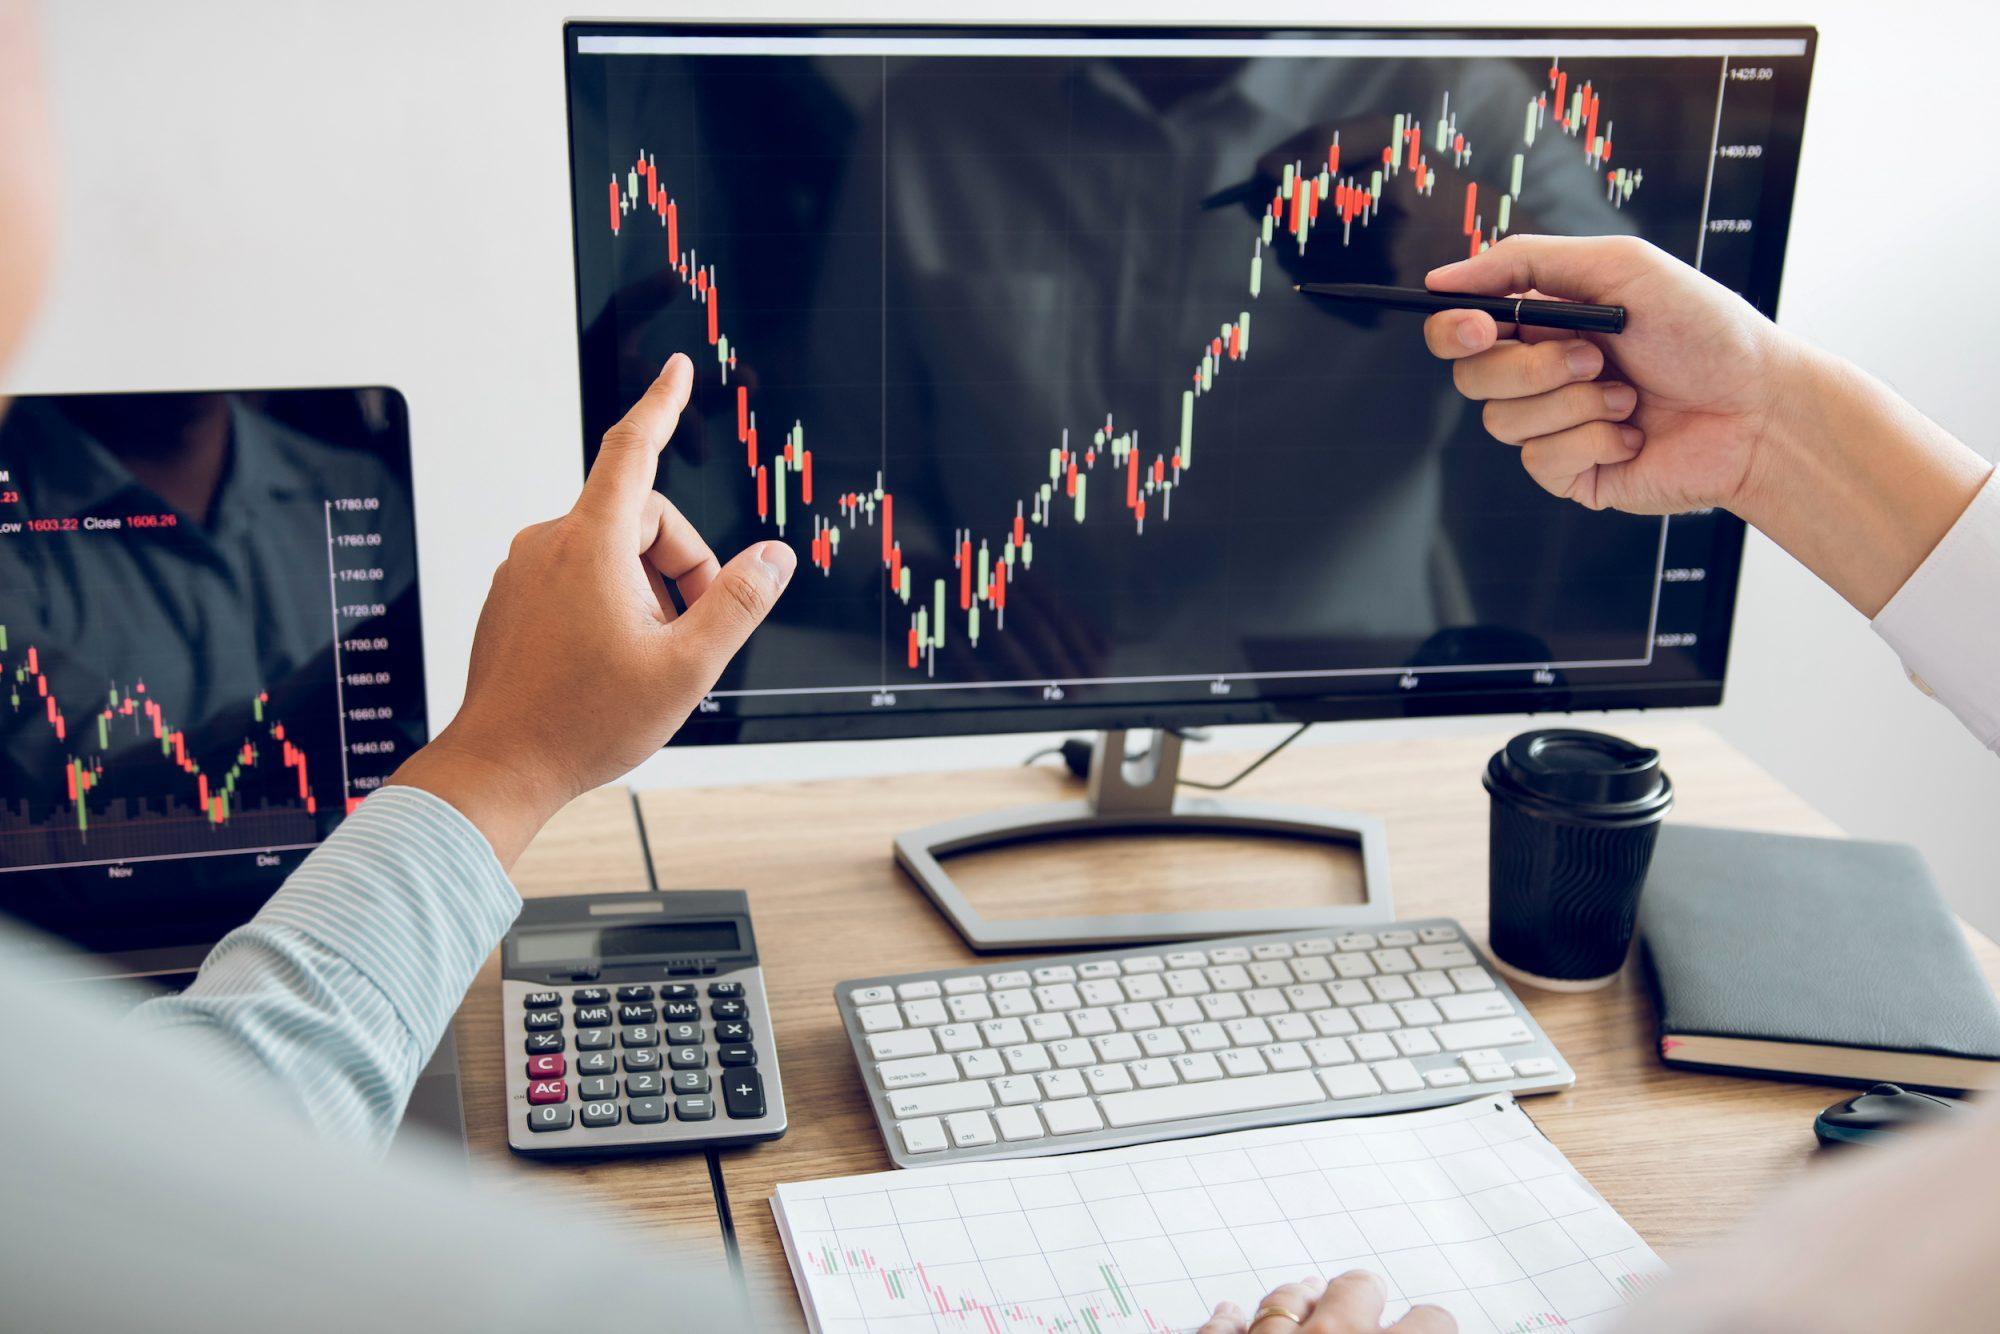 Qatar Stock Exchange Gains 0.78 Percent